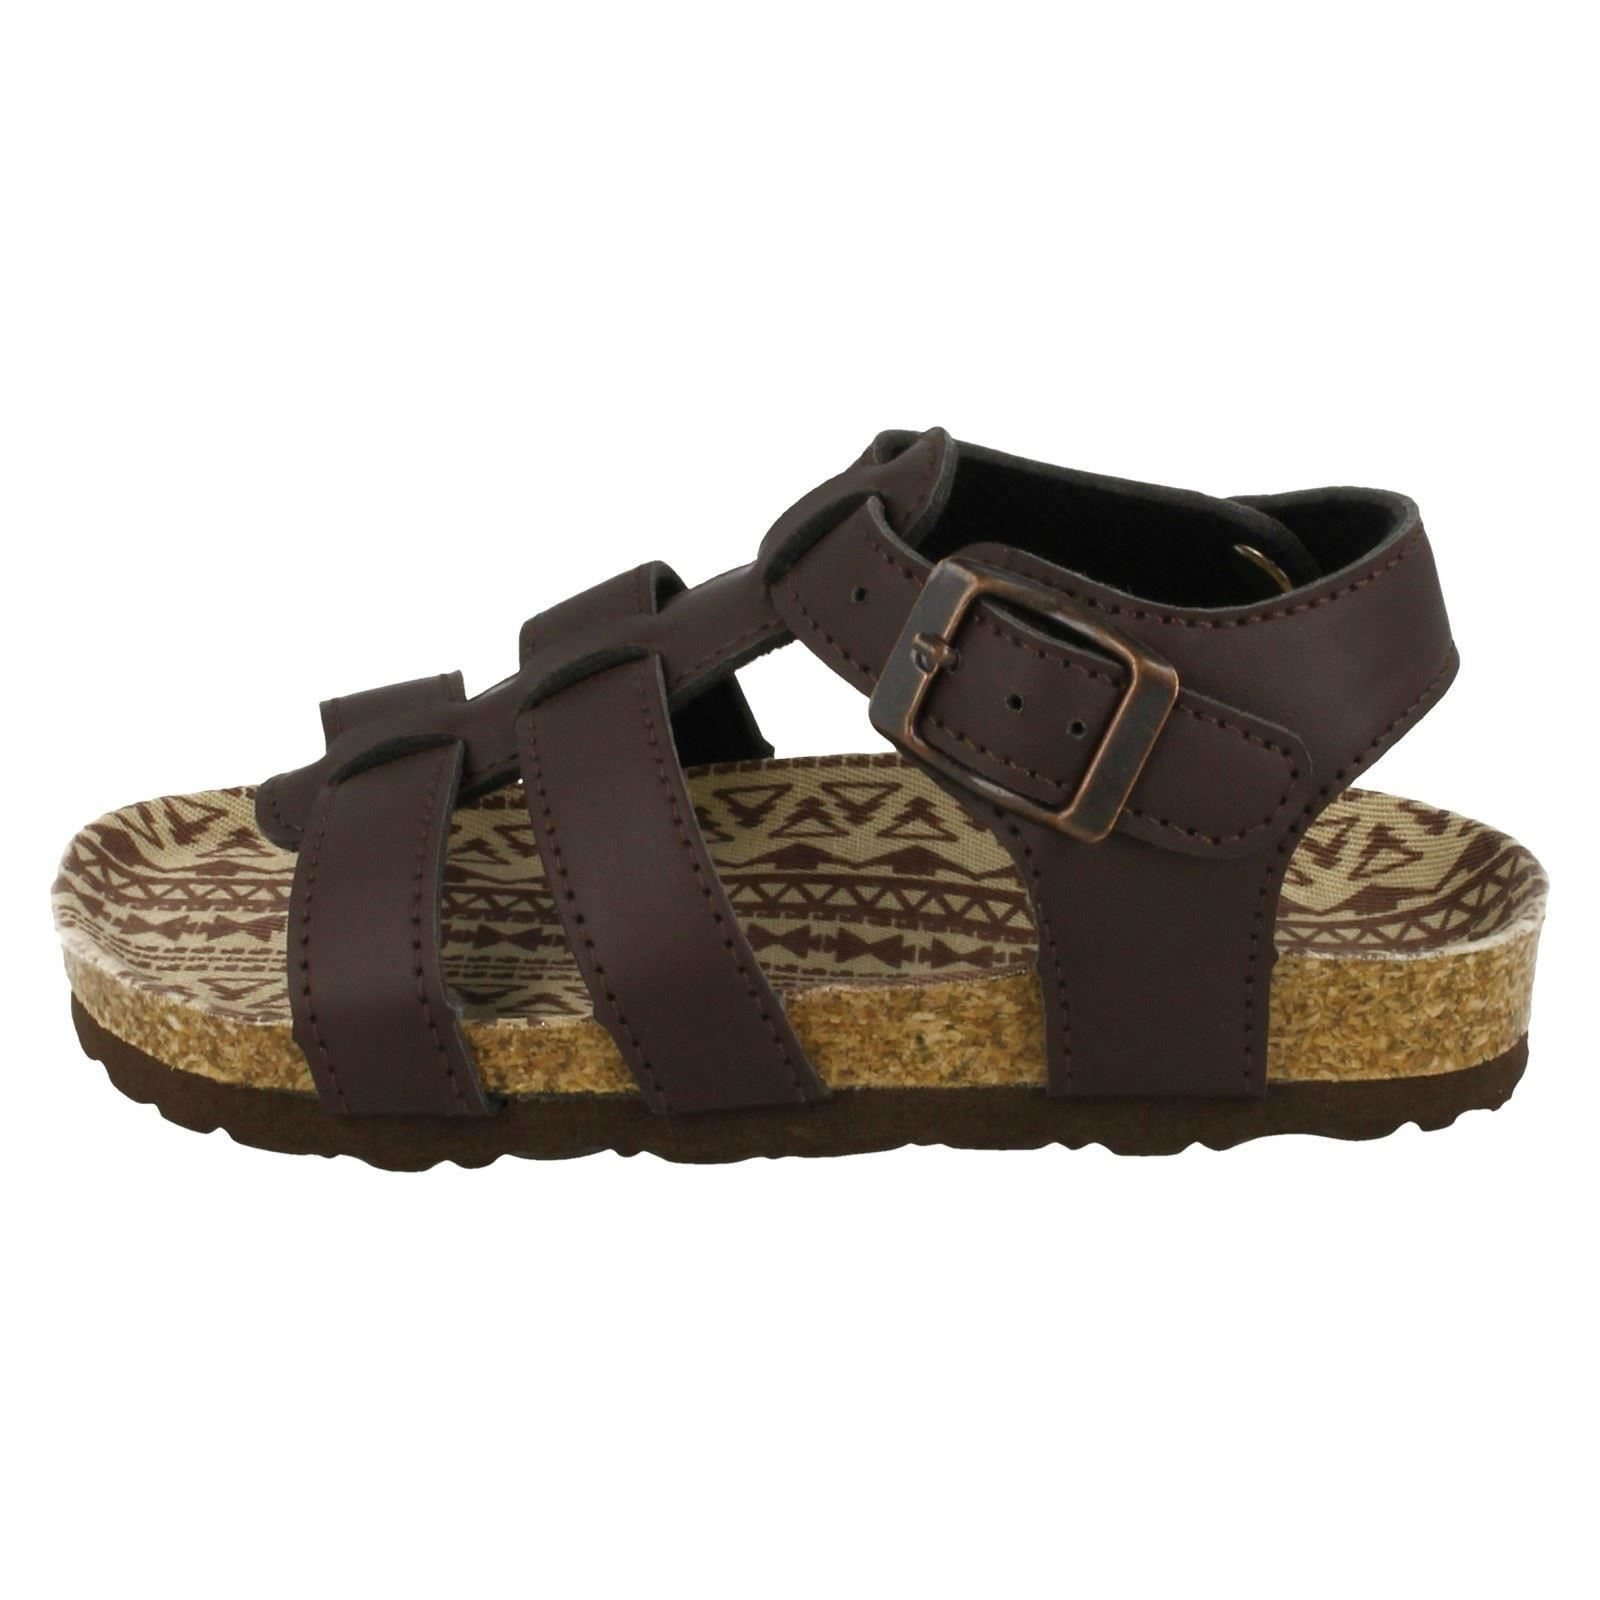 Boys Spot On Flat Strappy Sandals N0035   eBay